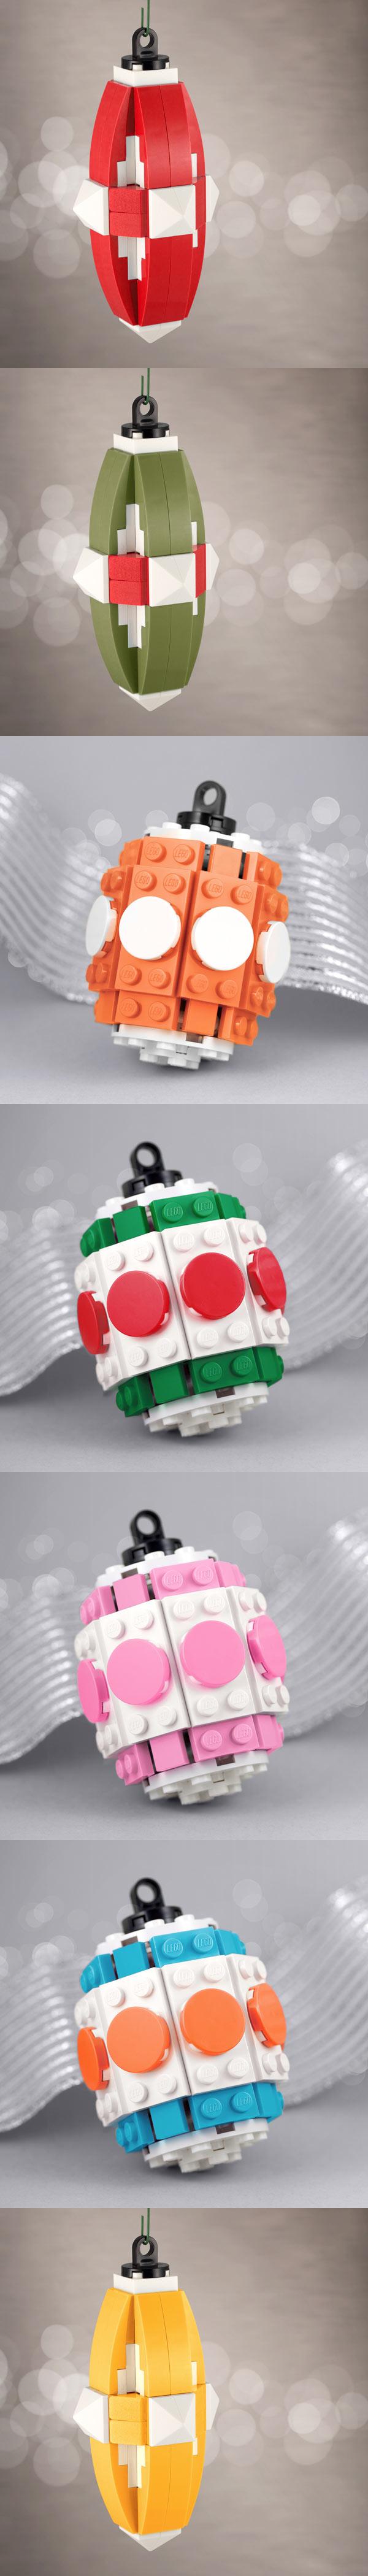 Adornos navideños hechos con LEGO